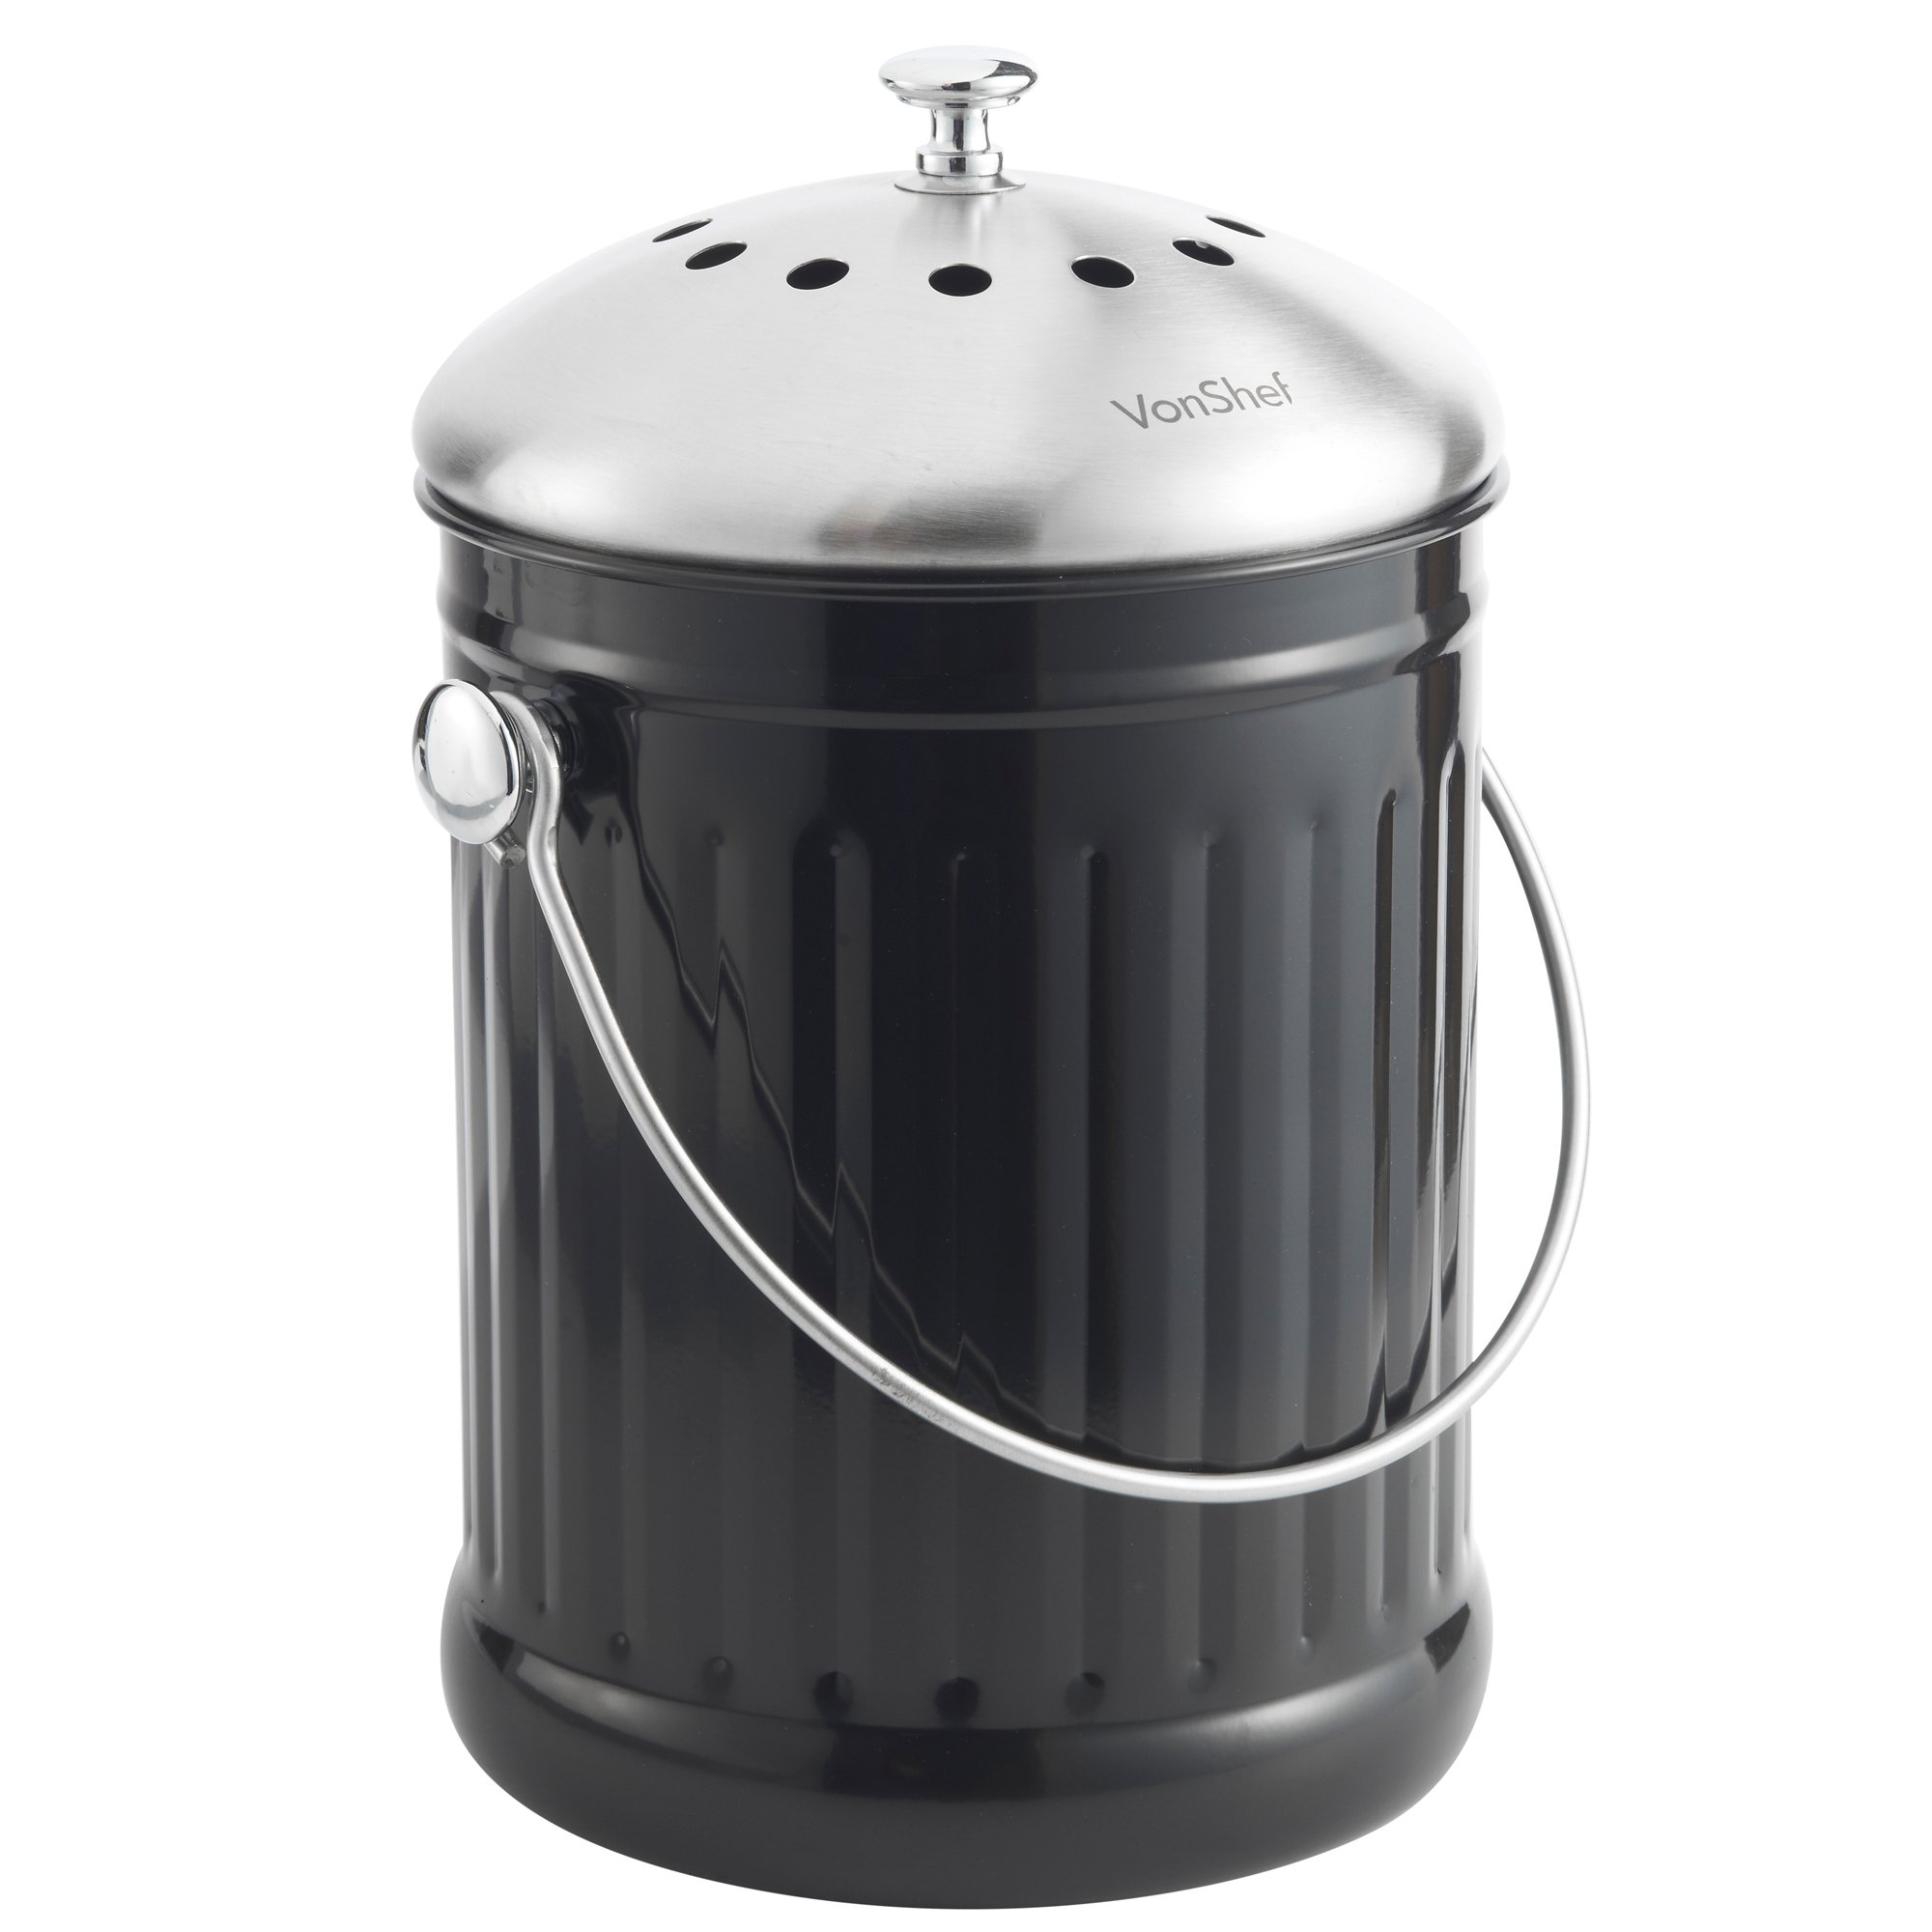 Vonshef 12 Gallon Countertop Kitchen Compost Bin